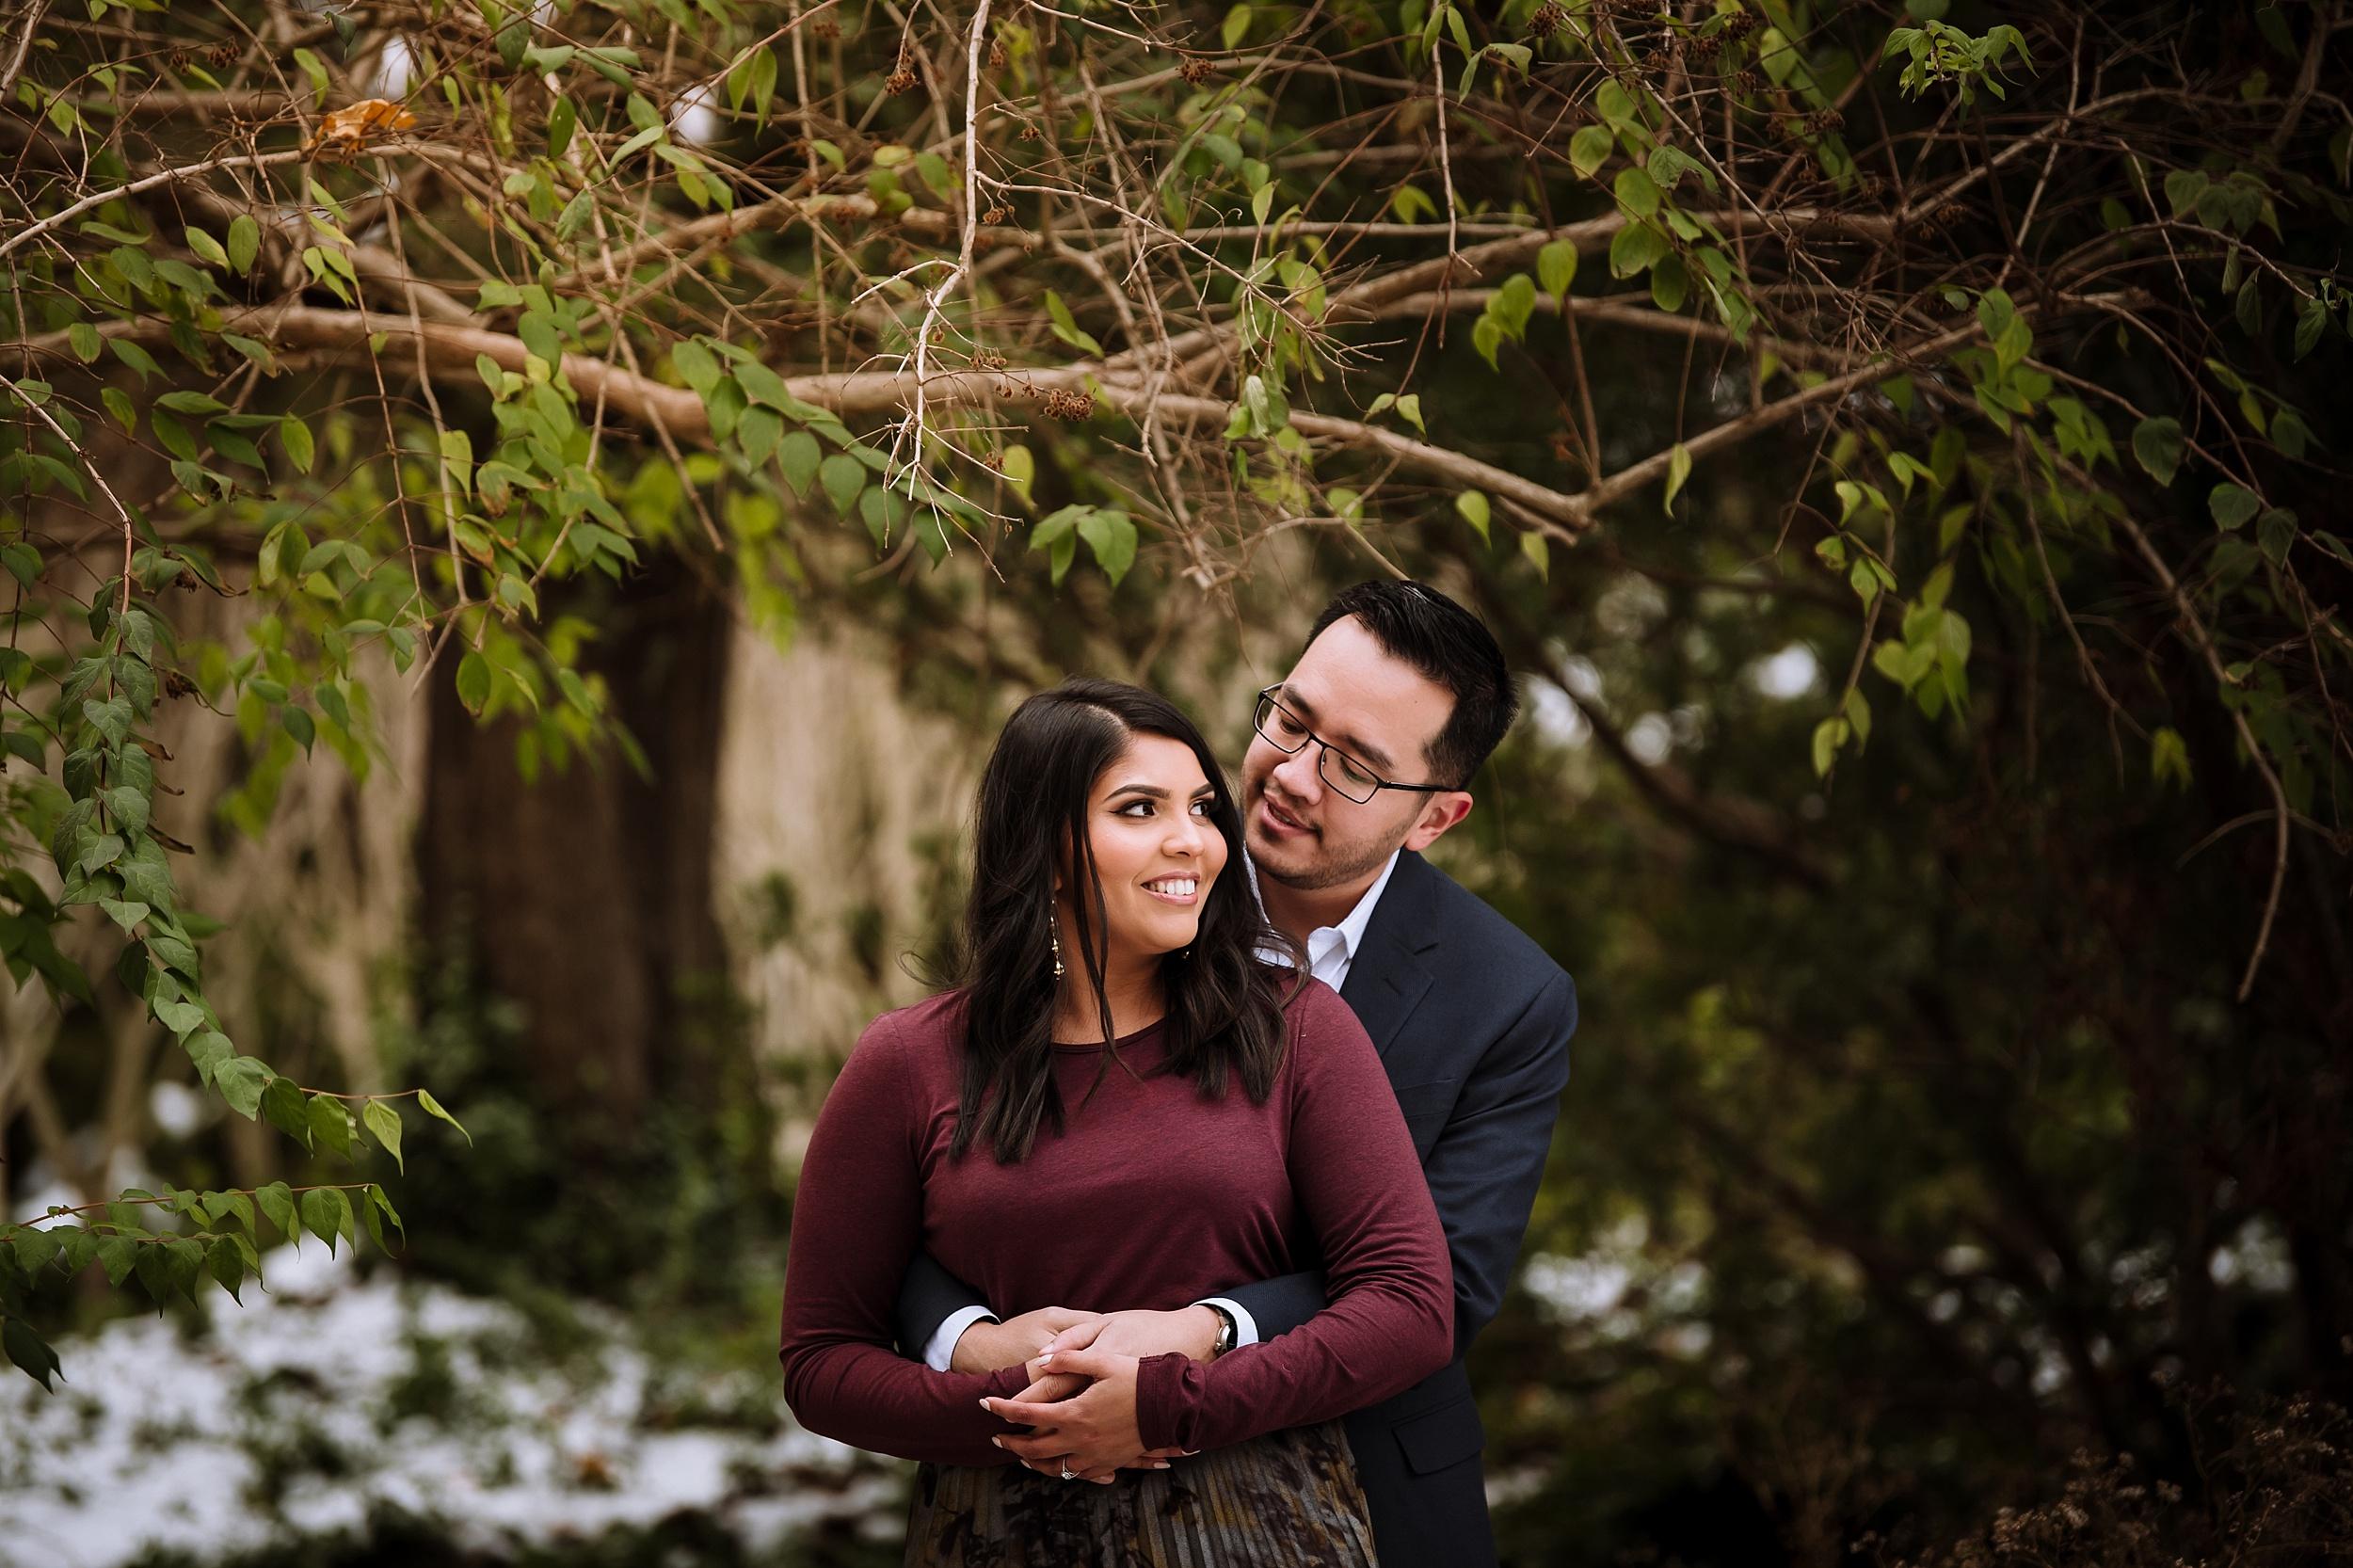 Alexander_Muir_Memorial_Gardens_Engagement_Shoot_Toronto_Wedding_Photographer_0005.jpg